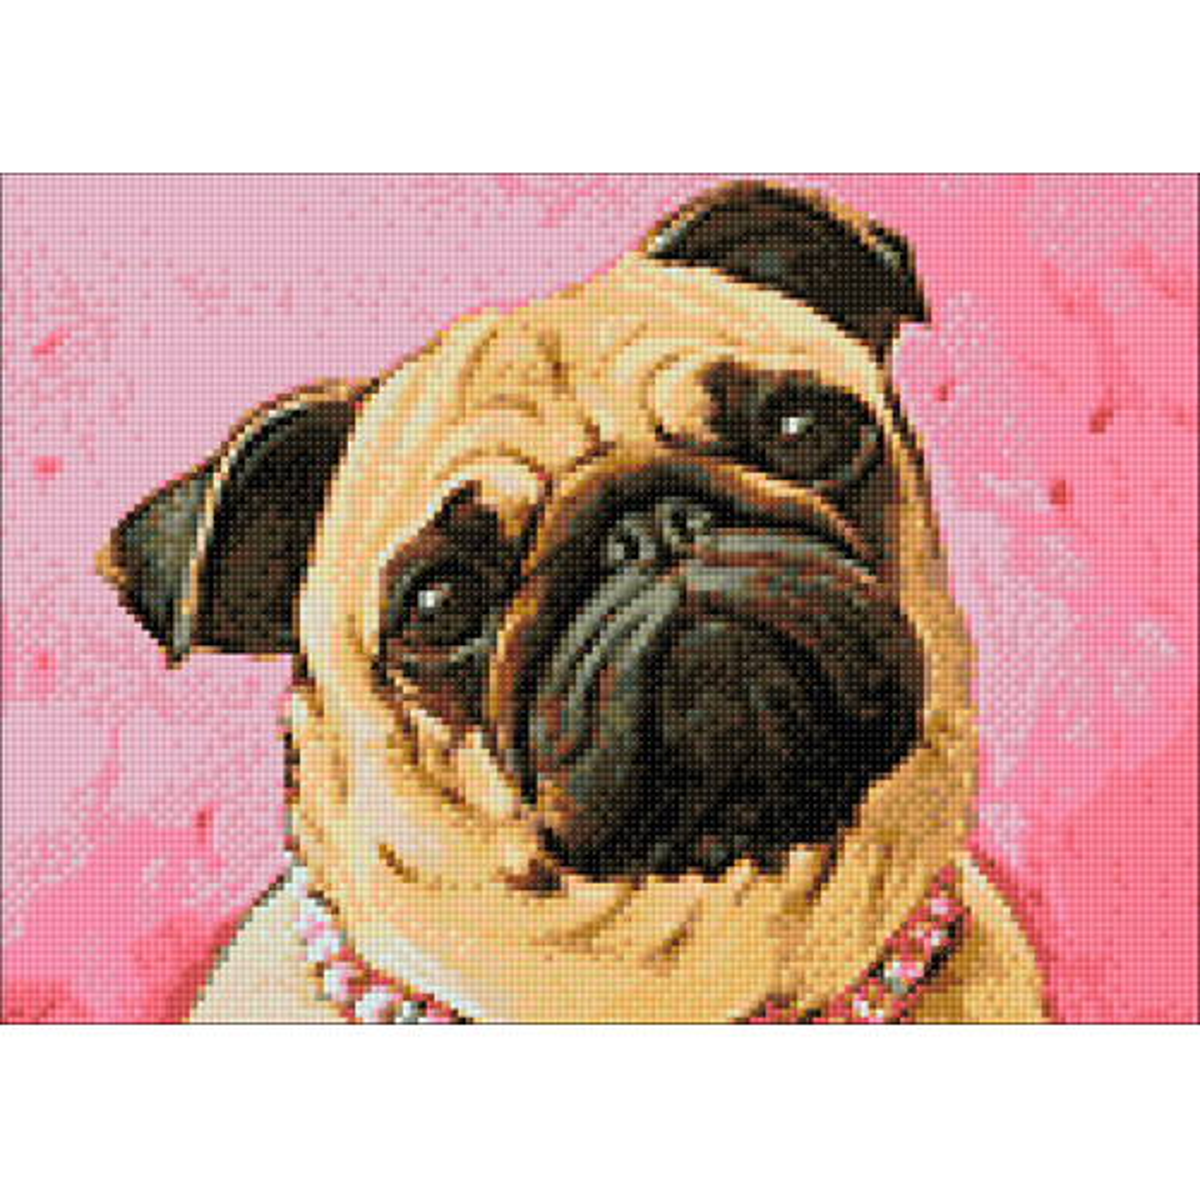 Ag 271 Набор д/изготовления картин со стразами 'Мопс' 38*27см Гранни